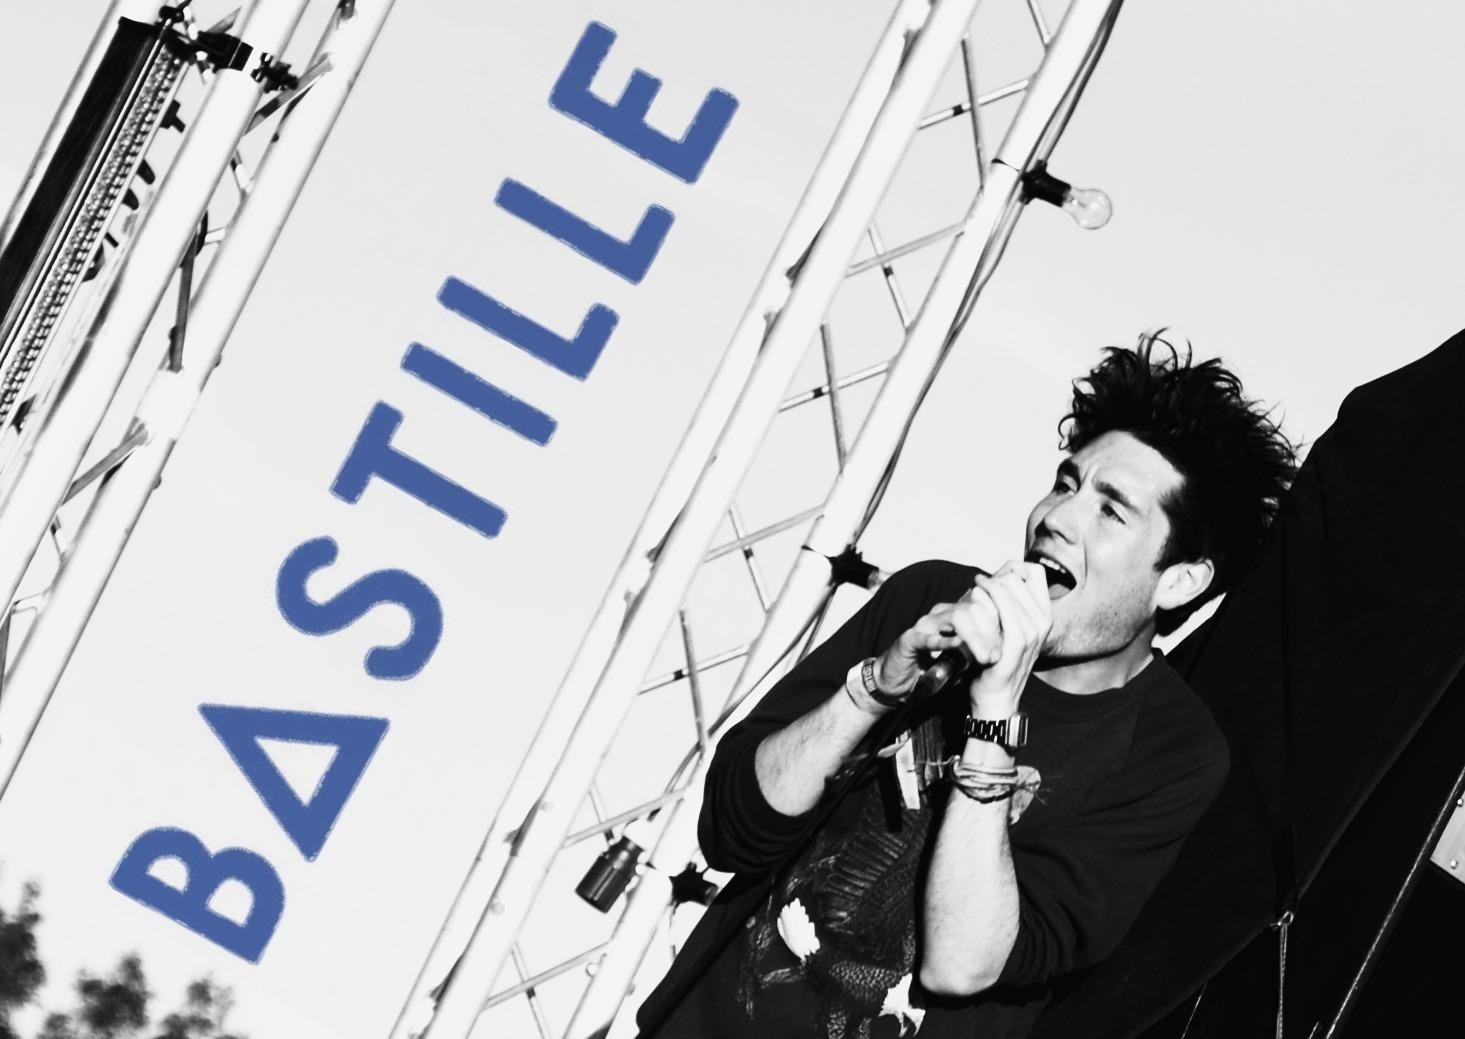 Dan Smith - Lead Singer In Bastille